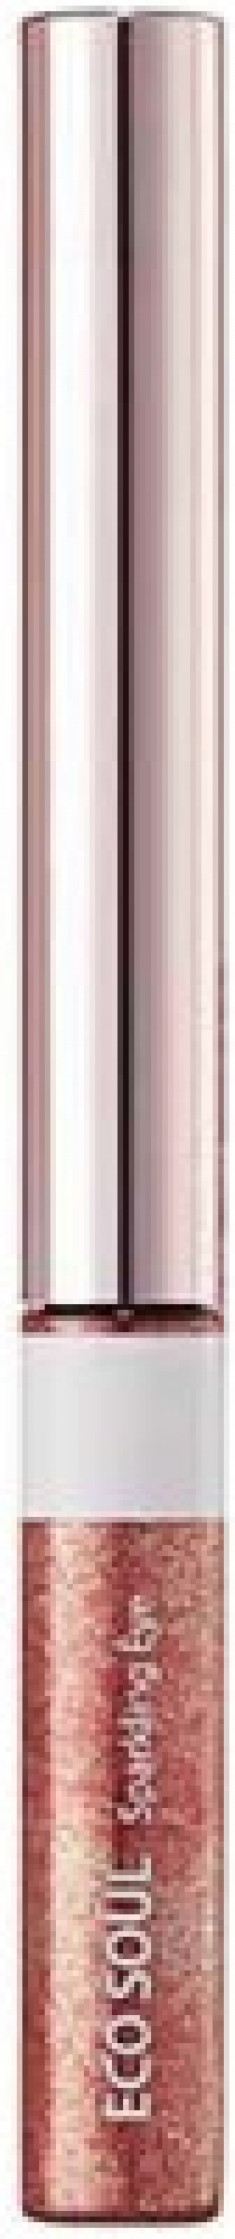 Тени для глаз сияющие The Saem Eco Soul Sparkling Eye PK02 Pink Tail 2,7гр